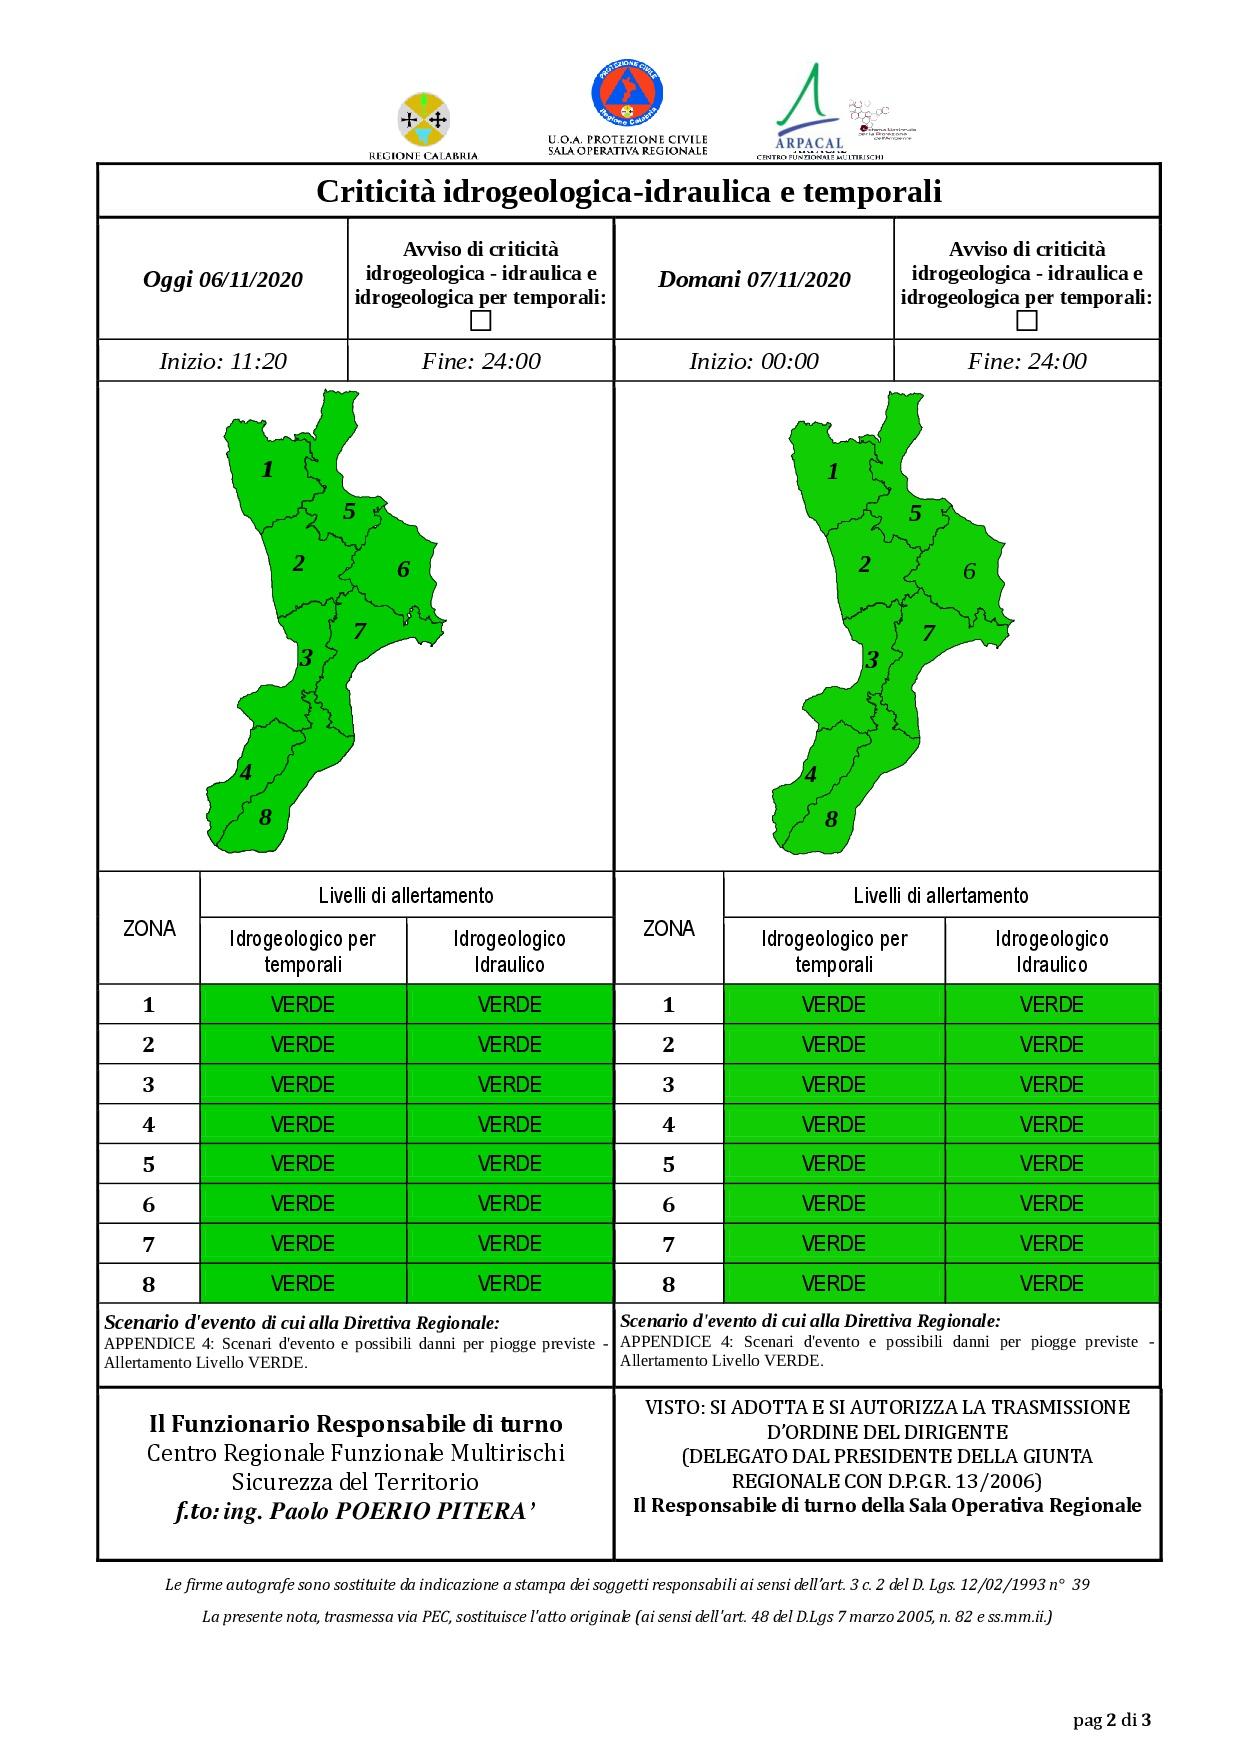 Criticità idrogeologica-idraulica e temporali in Calabria 06-11-2020